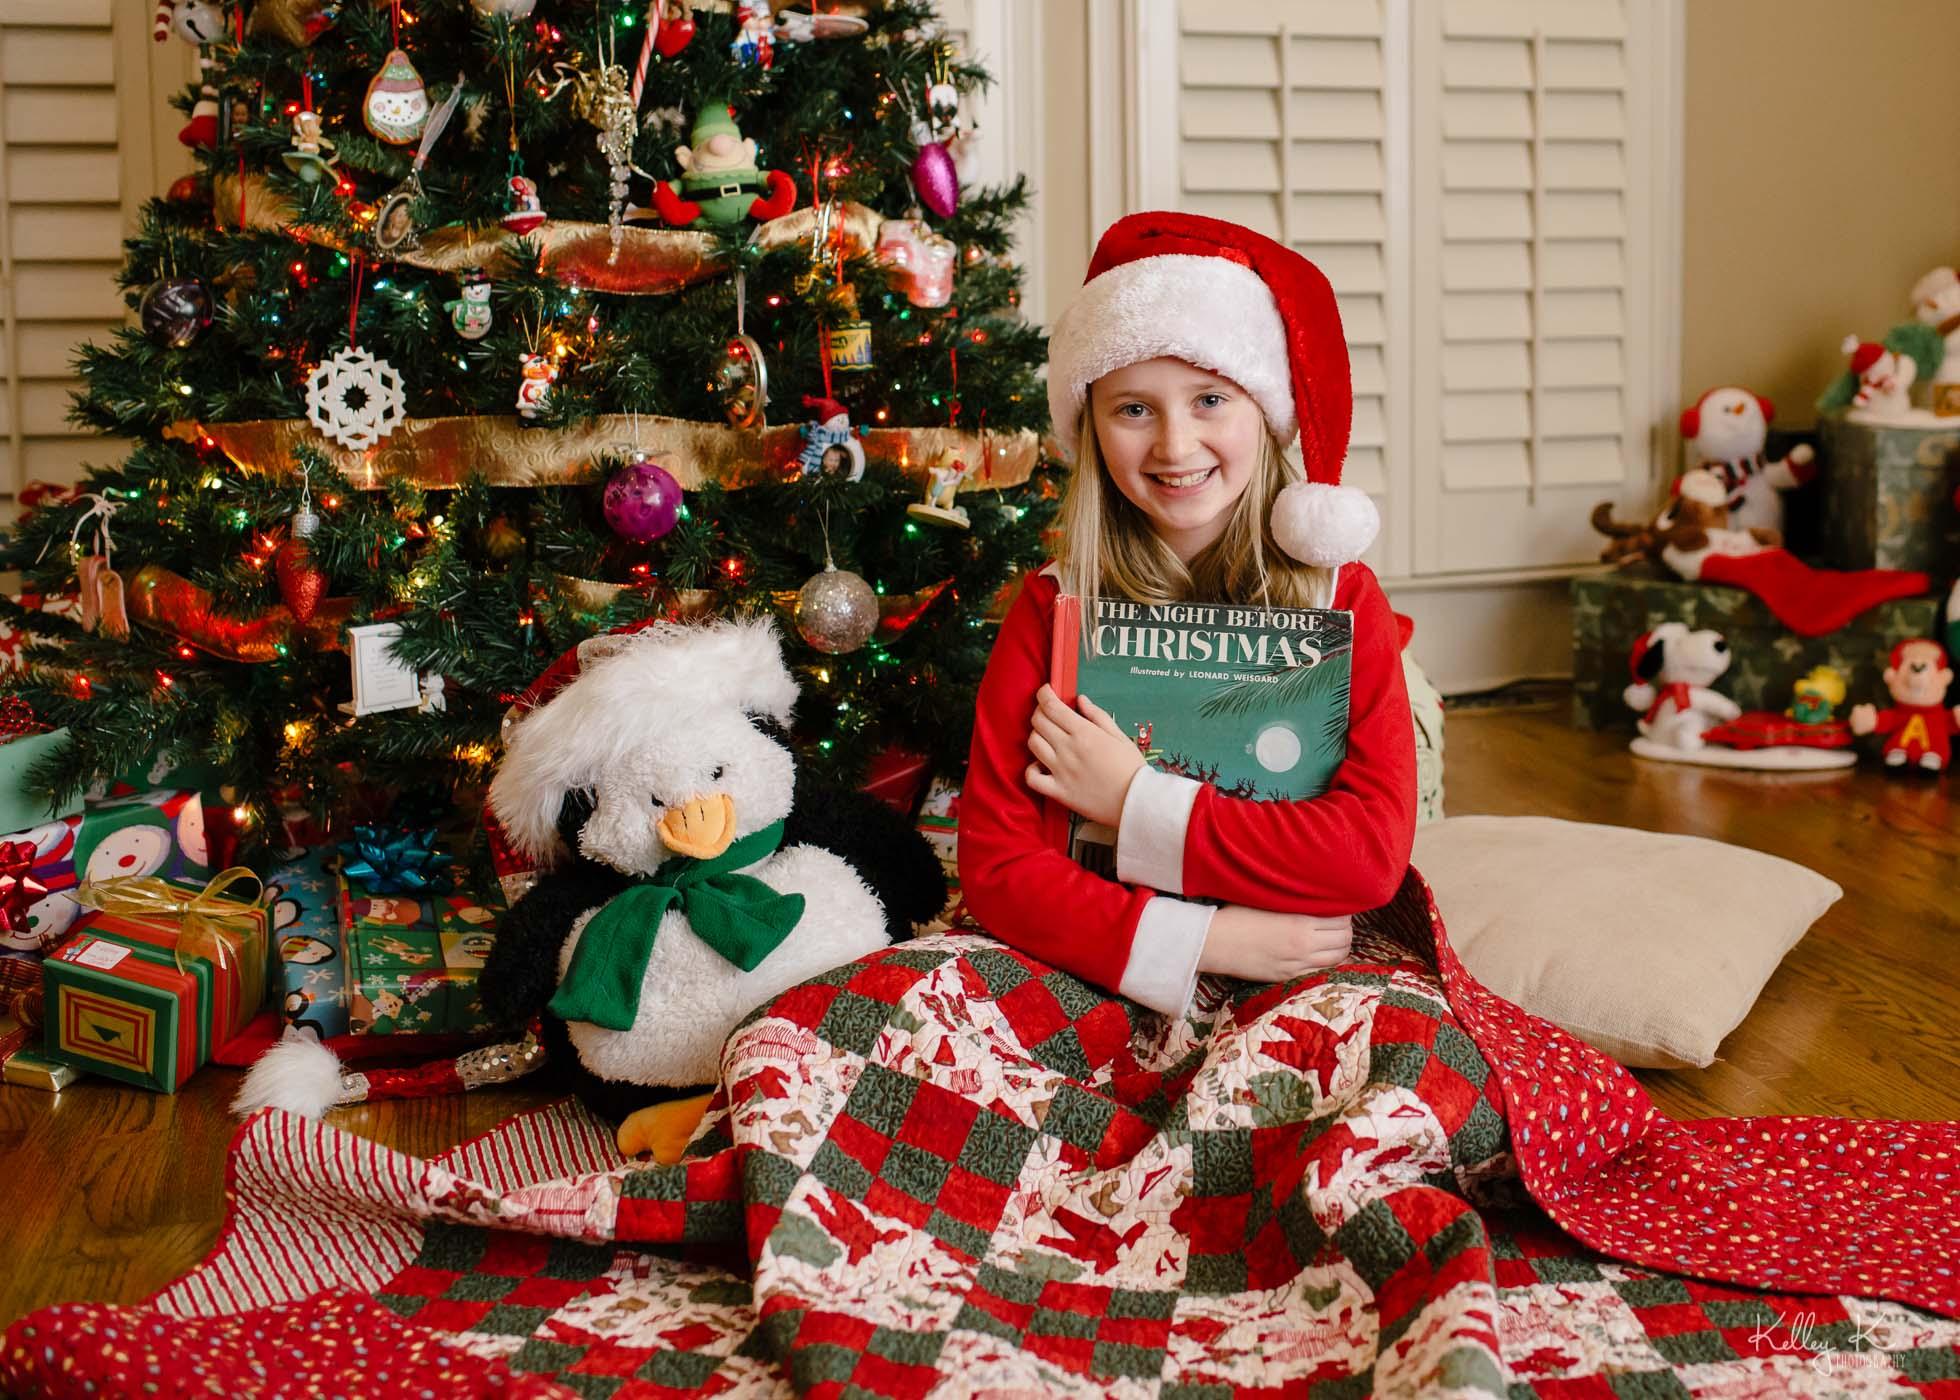 the-night-before-Christmas-by-KelleyKPhotography-Smyrna